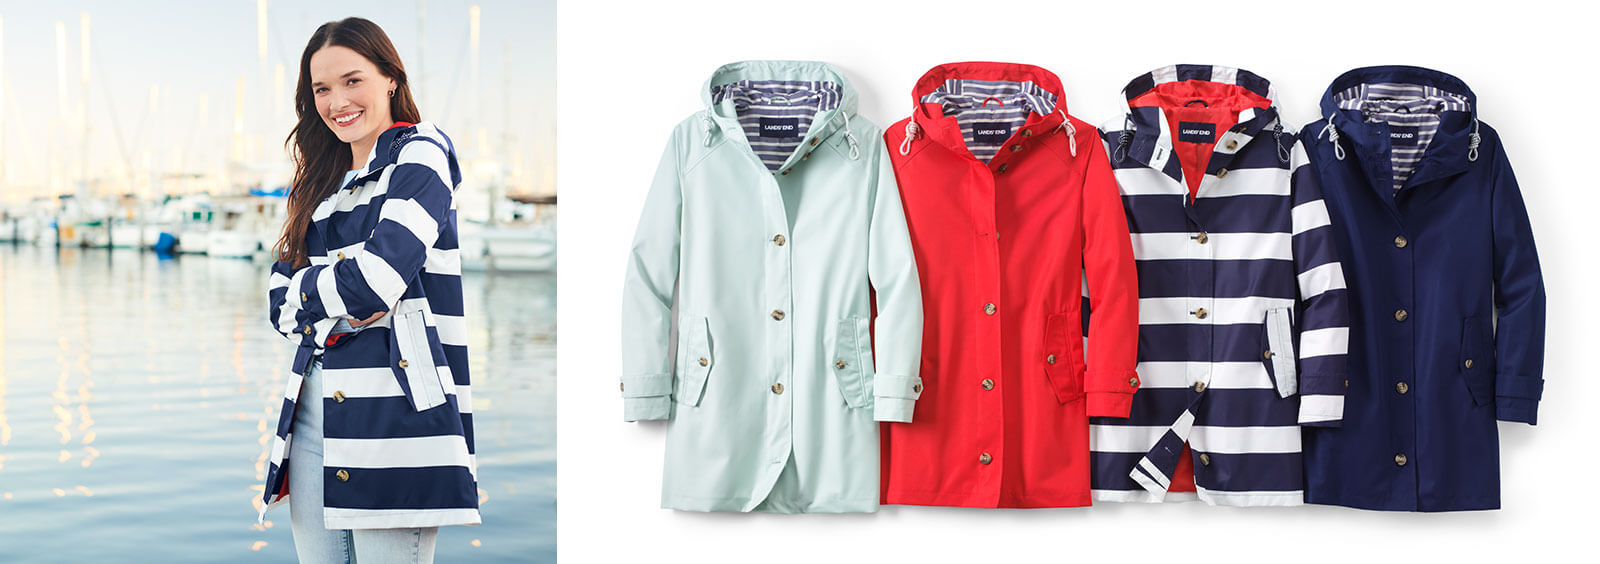 How to Wash a Rain Jacket